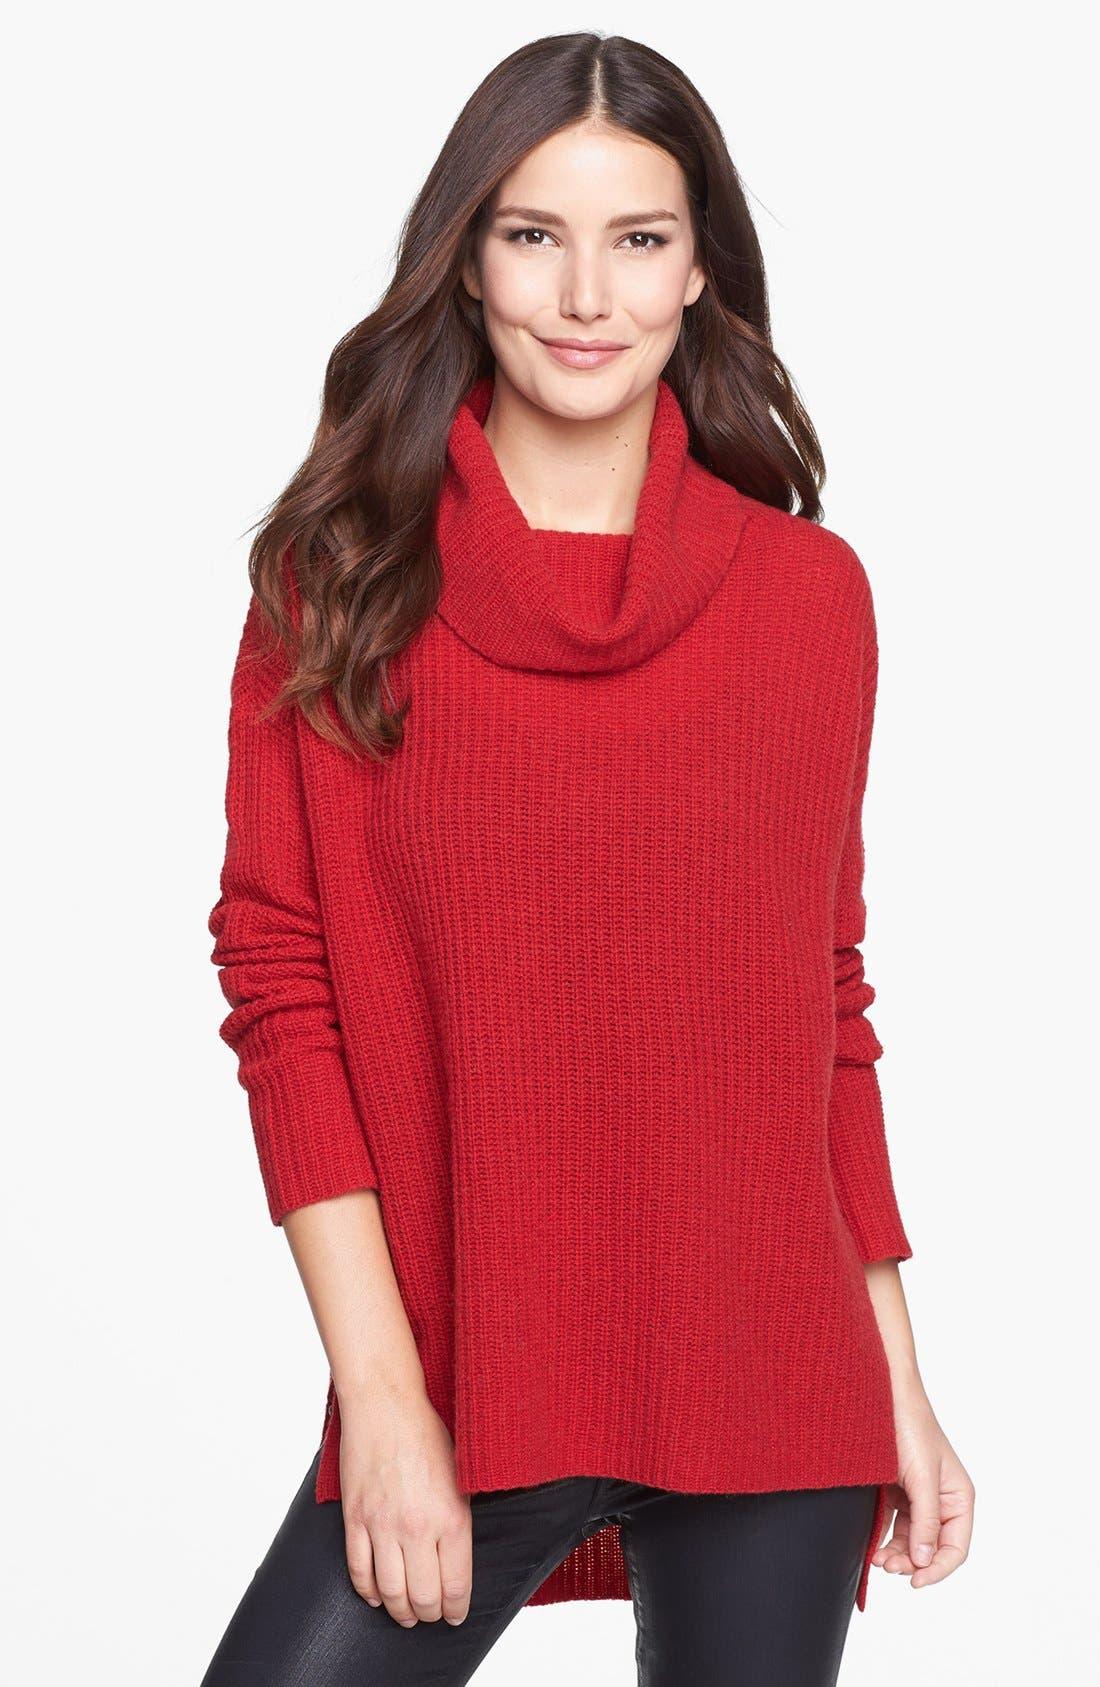 Alternate Image 1 Selected - Eileen Fisher Merino & Yak Wool Turtleneck Sweater